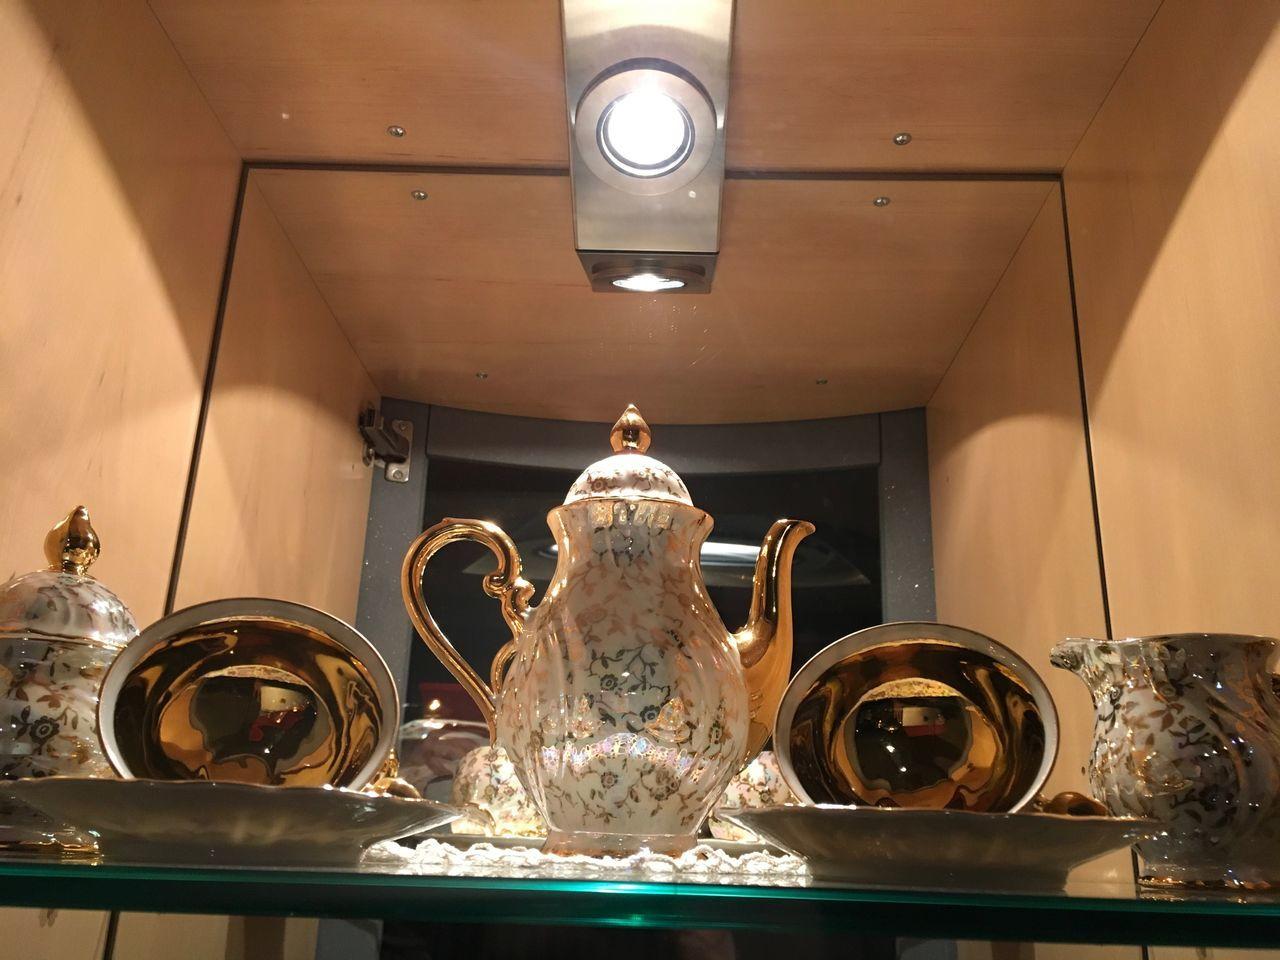 lighting equipment, indoors, no people, illuminated, luxury, day